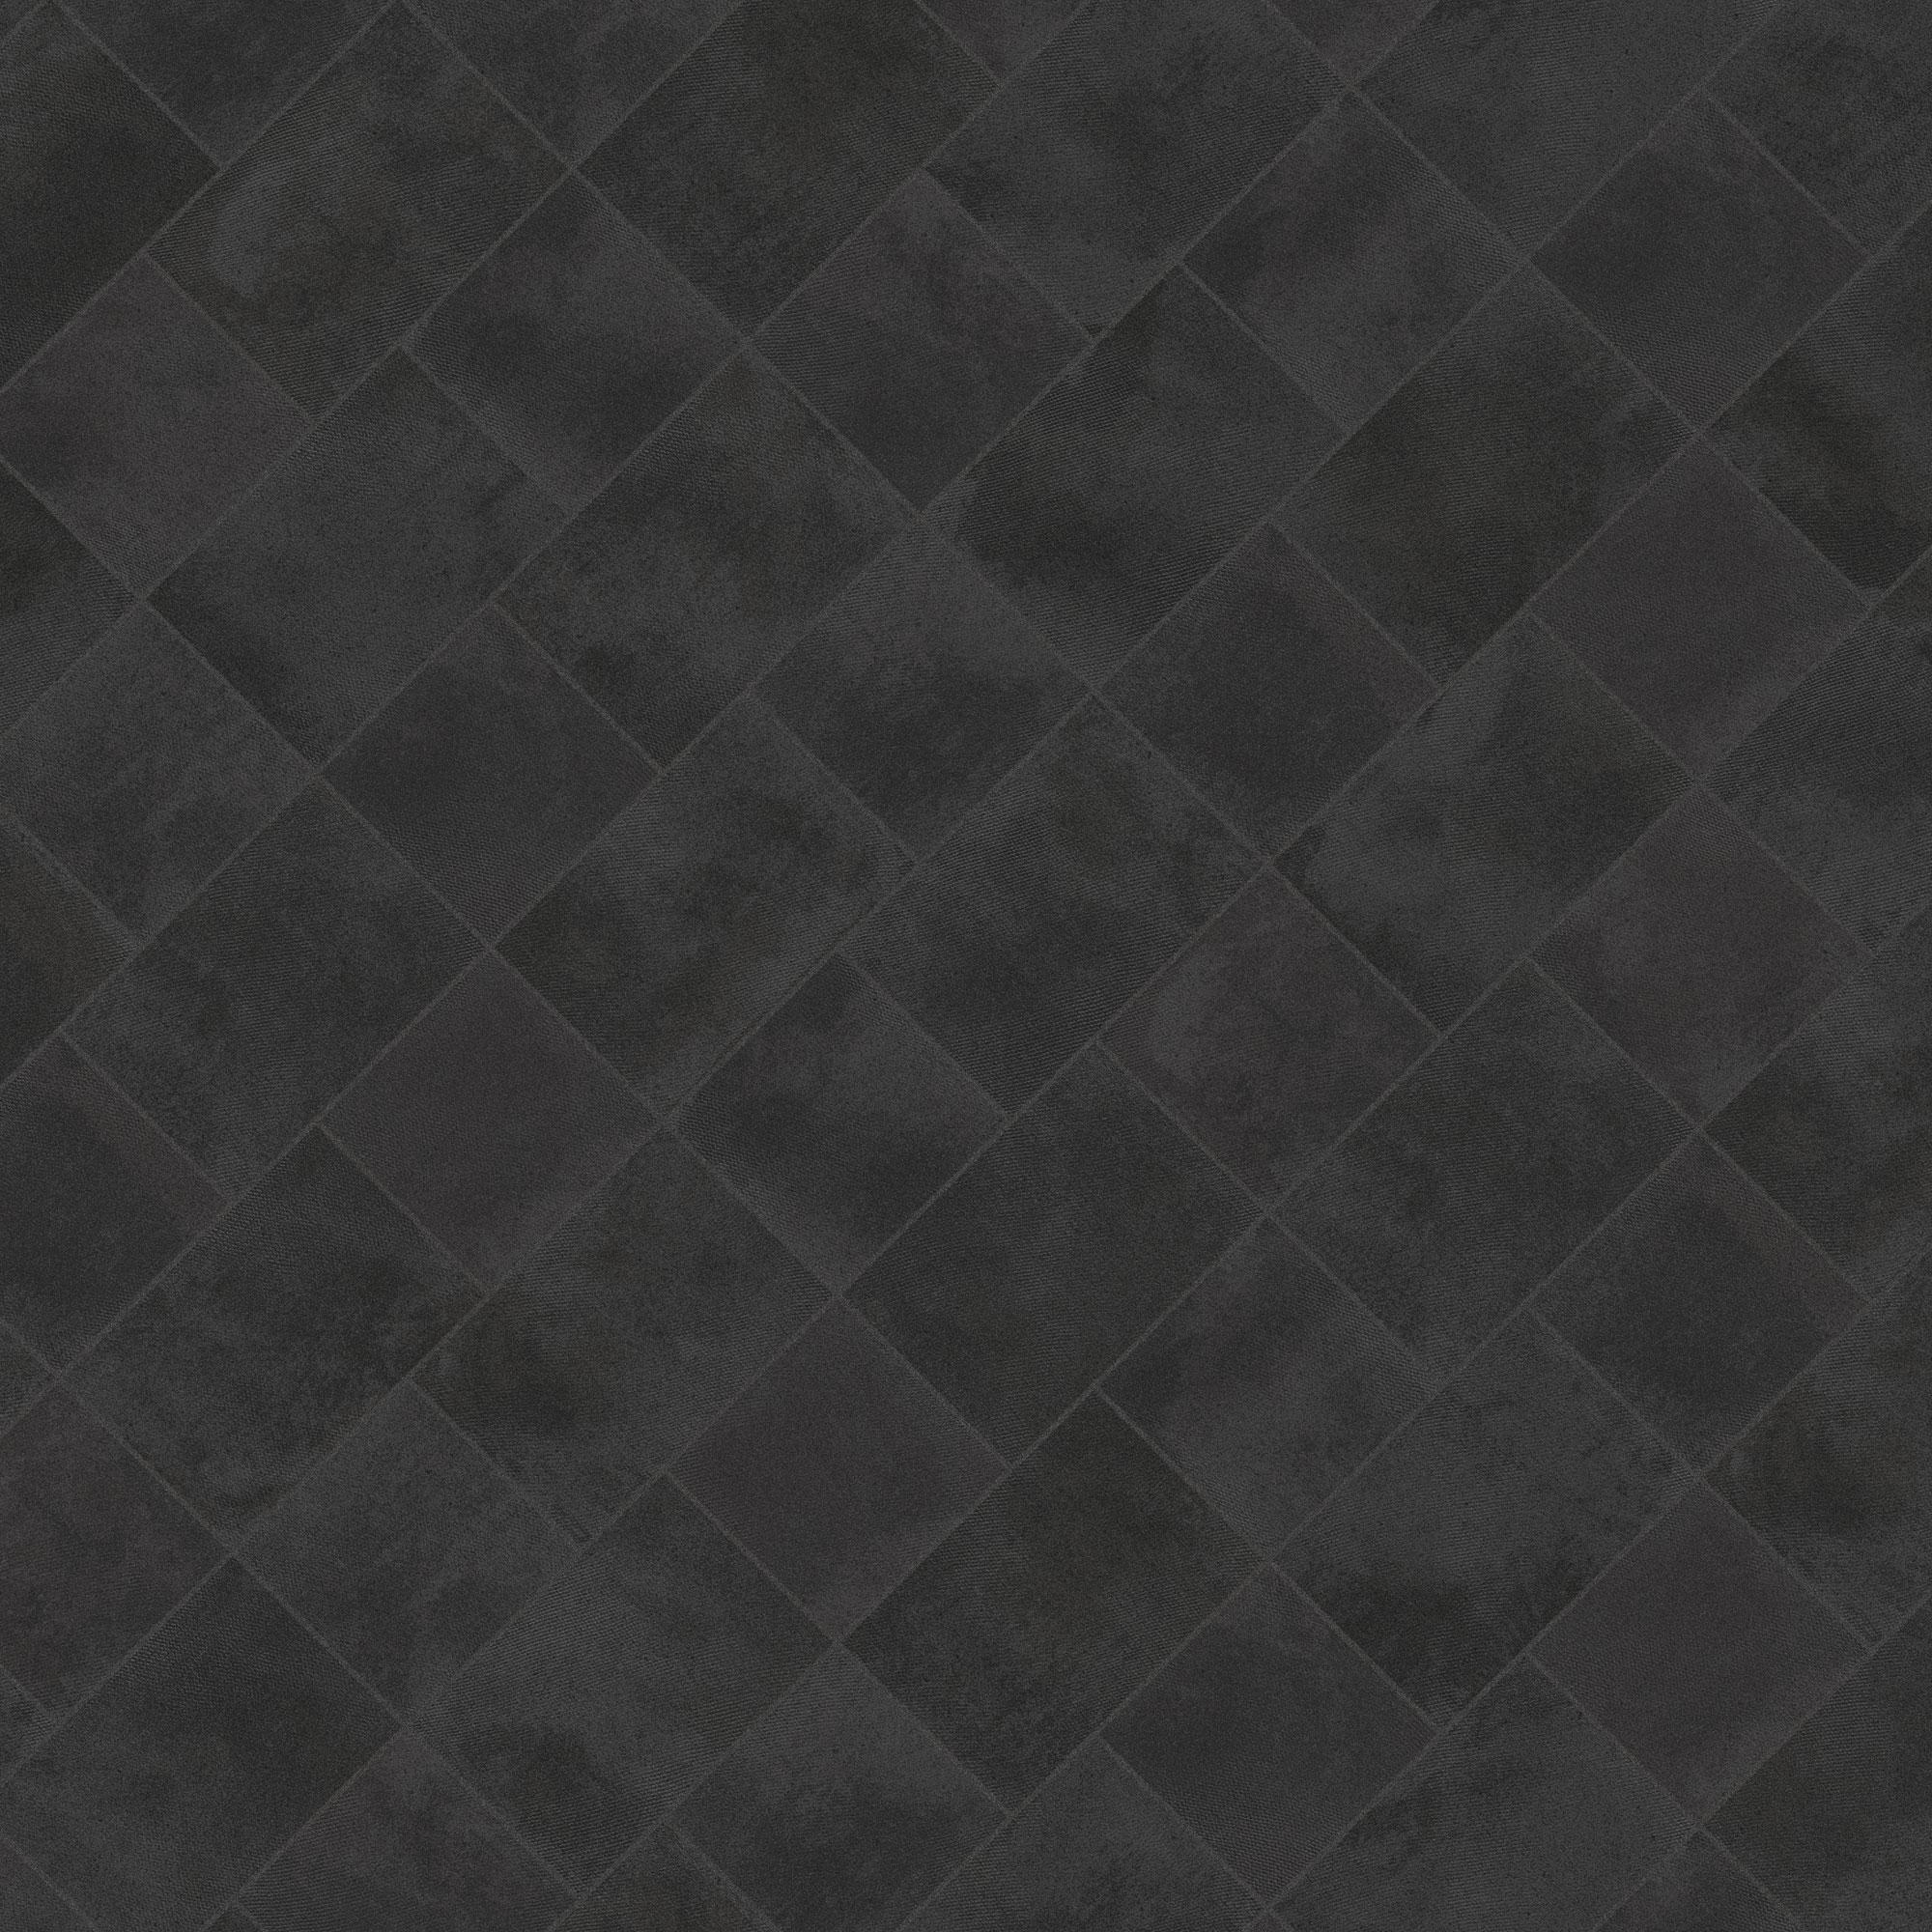 SOUL BLACK panel - Soul